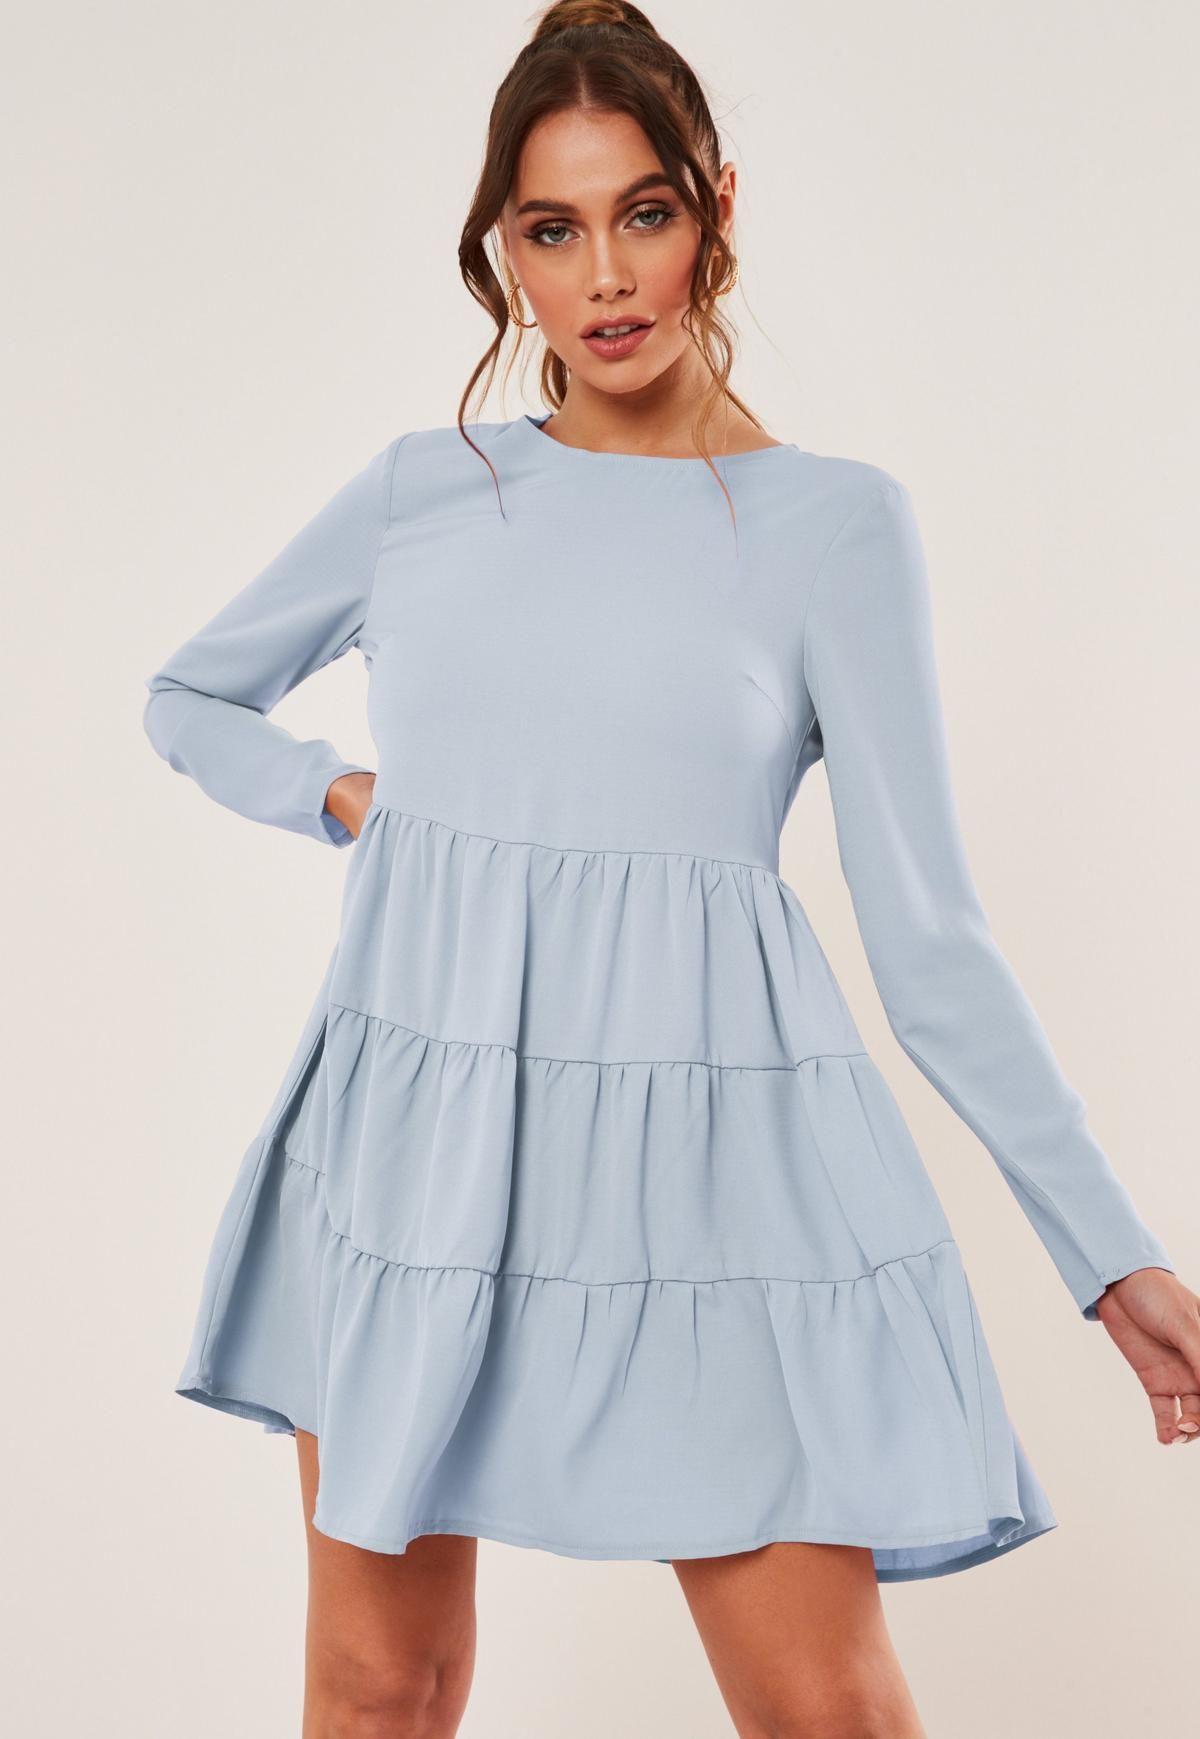 Missguided Blue Chiffon Tiered Smock Dress Tiered Dress Casual Pastel Dress Casual Blue Dress Casual [ 1739 x 1200 Pixel ]